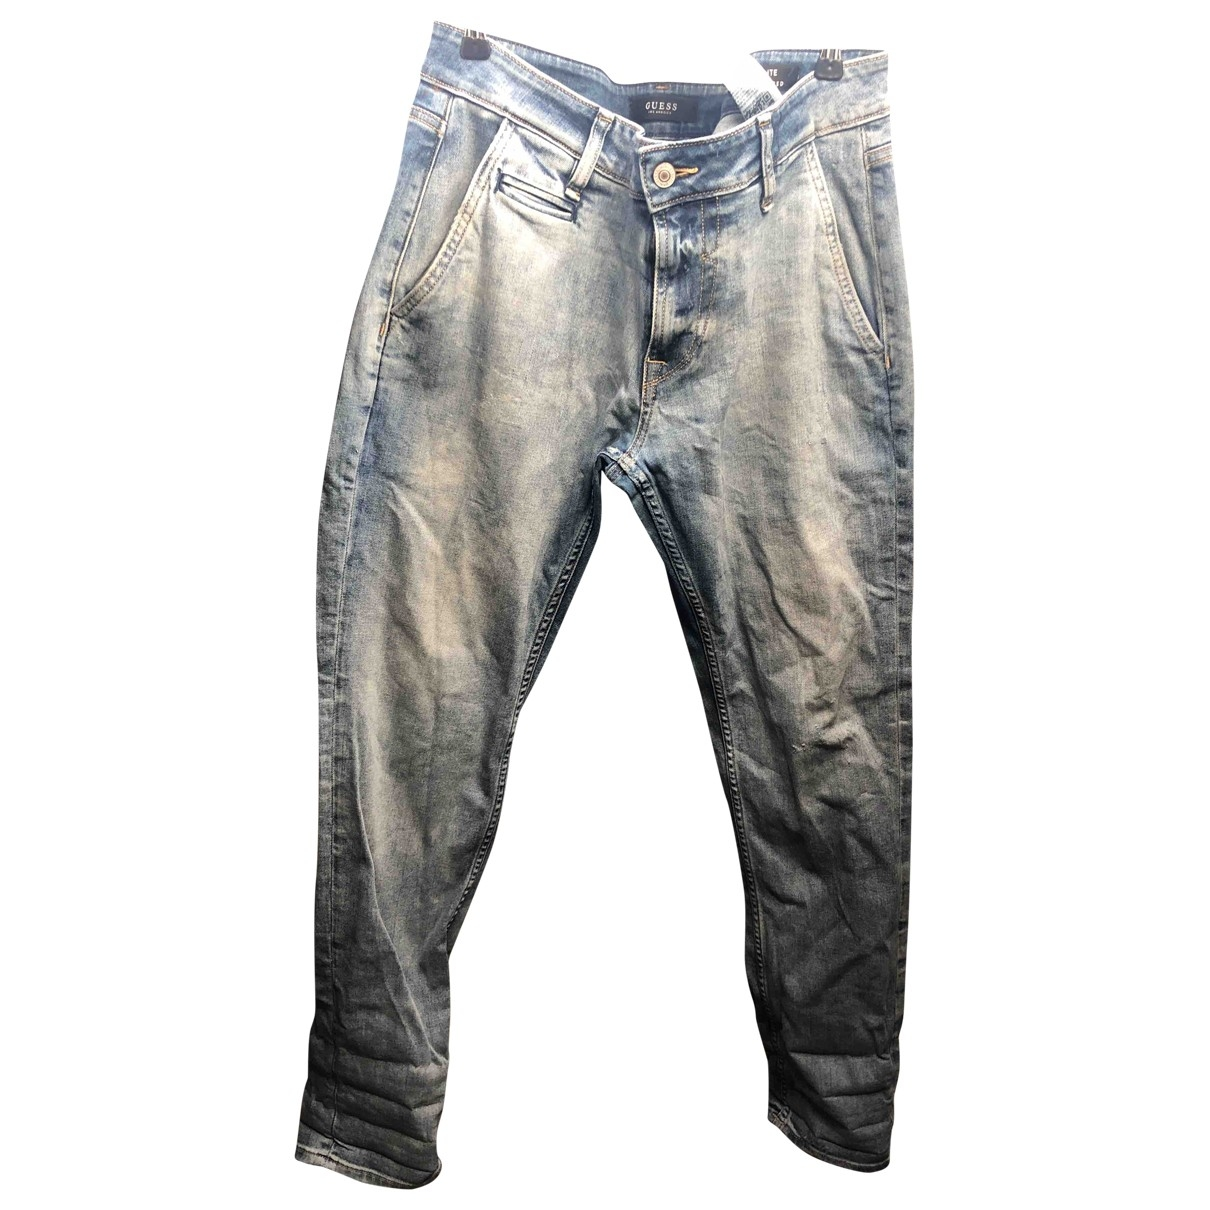 Guess - Jean   pour homme en coton - elasthane - anthracite